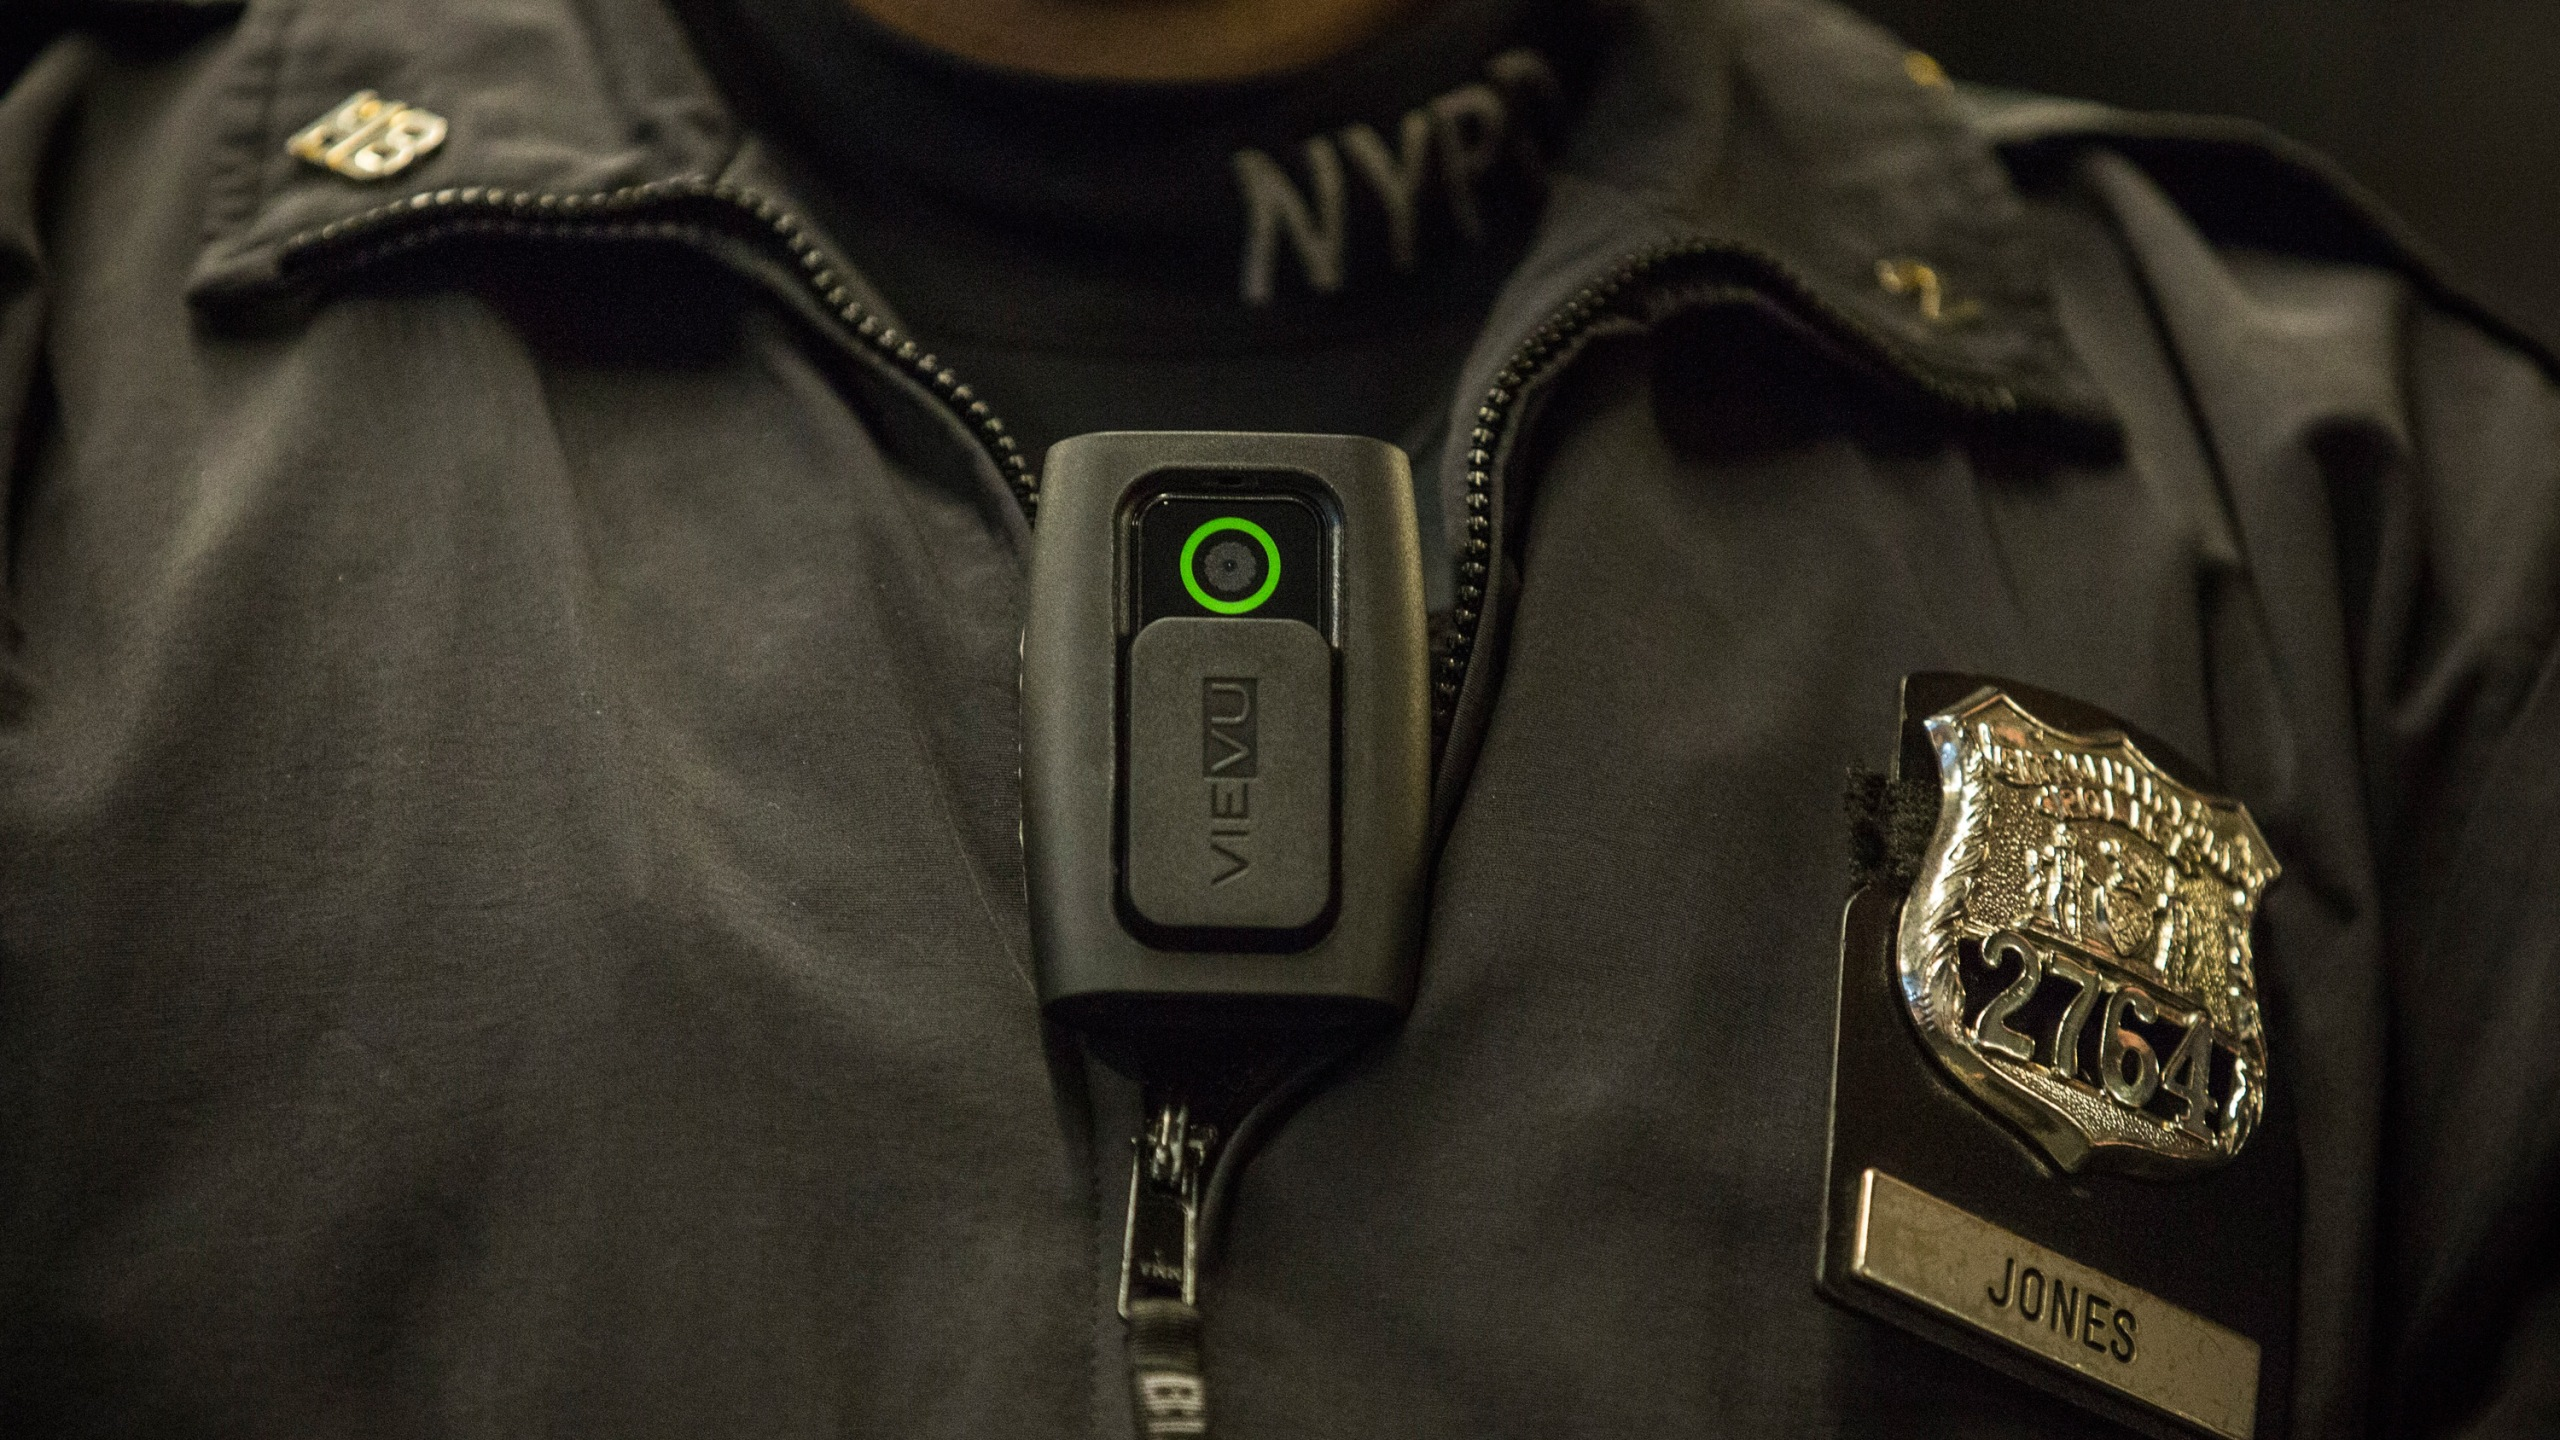 NYPD set to deploy 1,200 bodycams around thecity